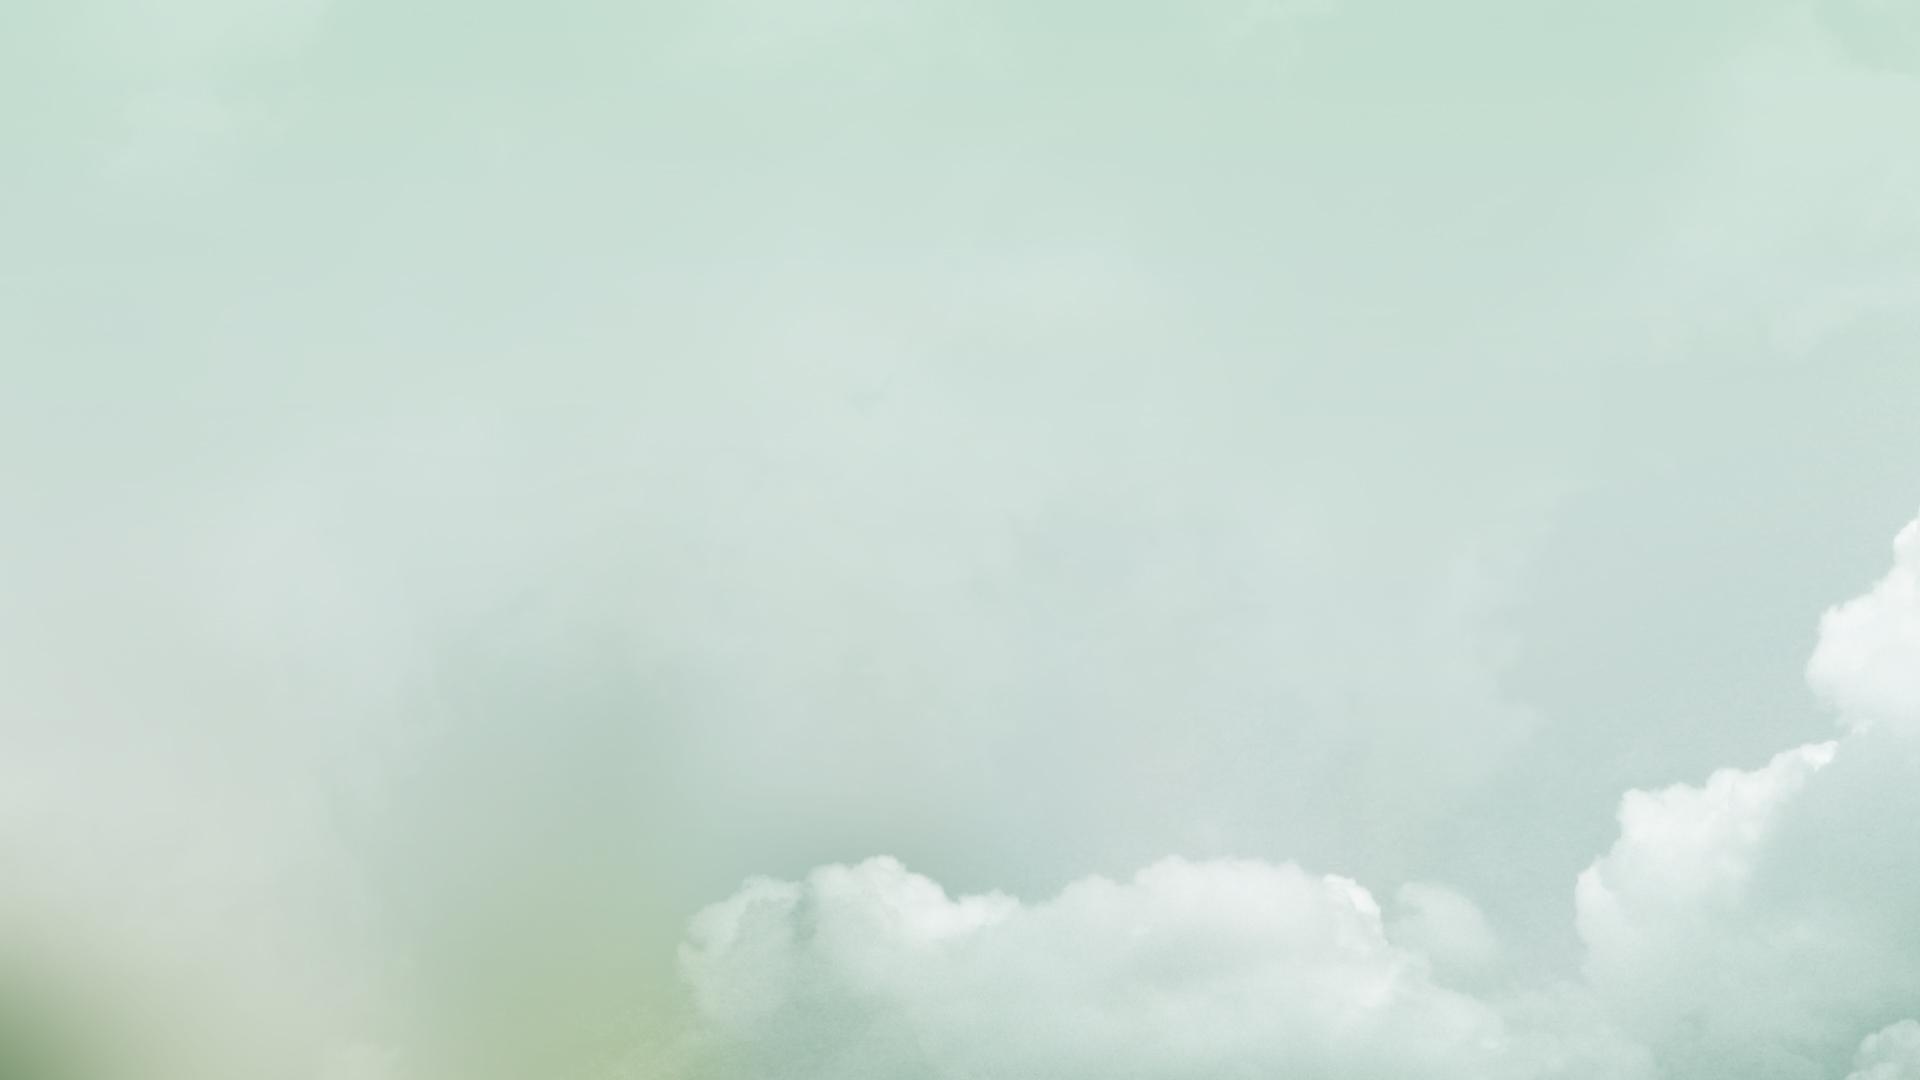 Download minimal clouds wallpaper HD wallpaper 1920x1080